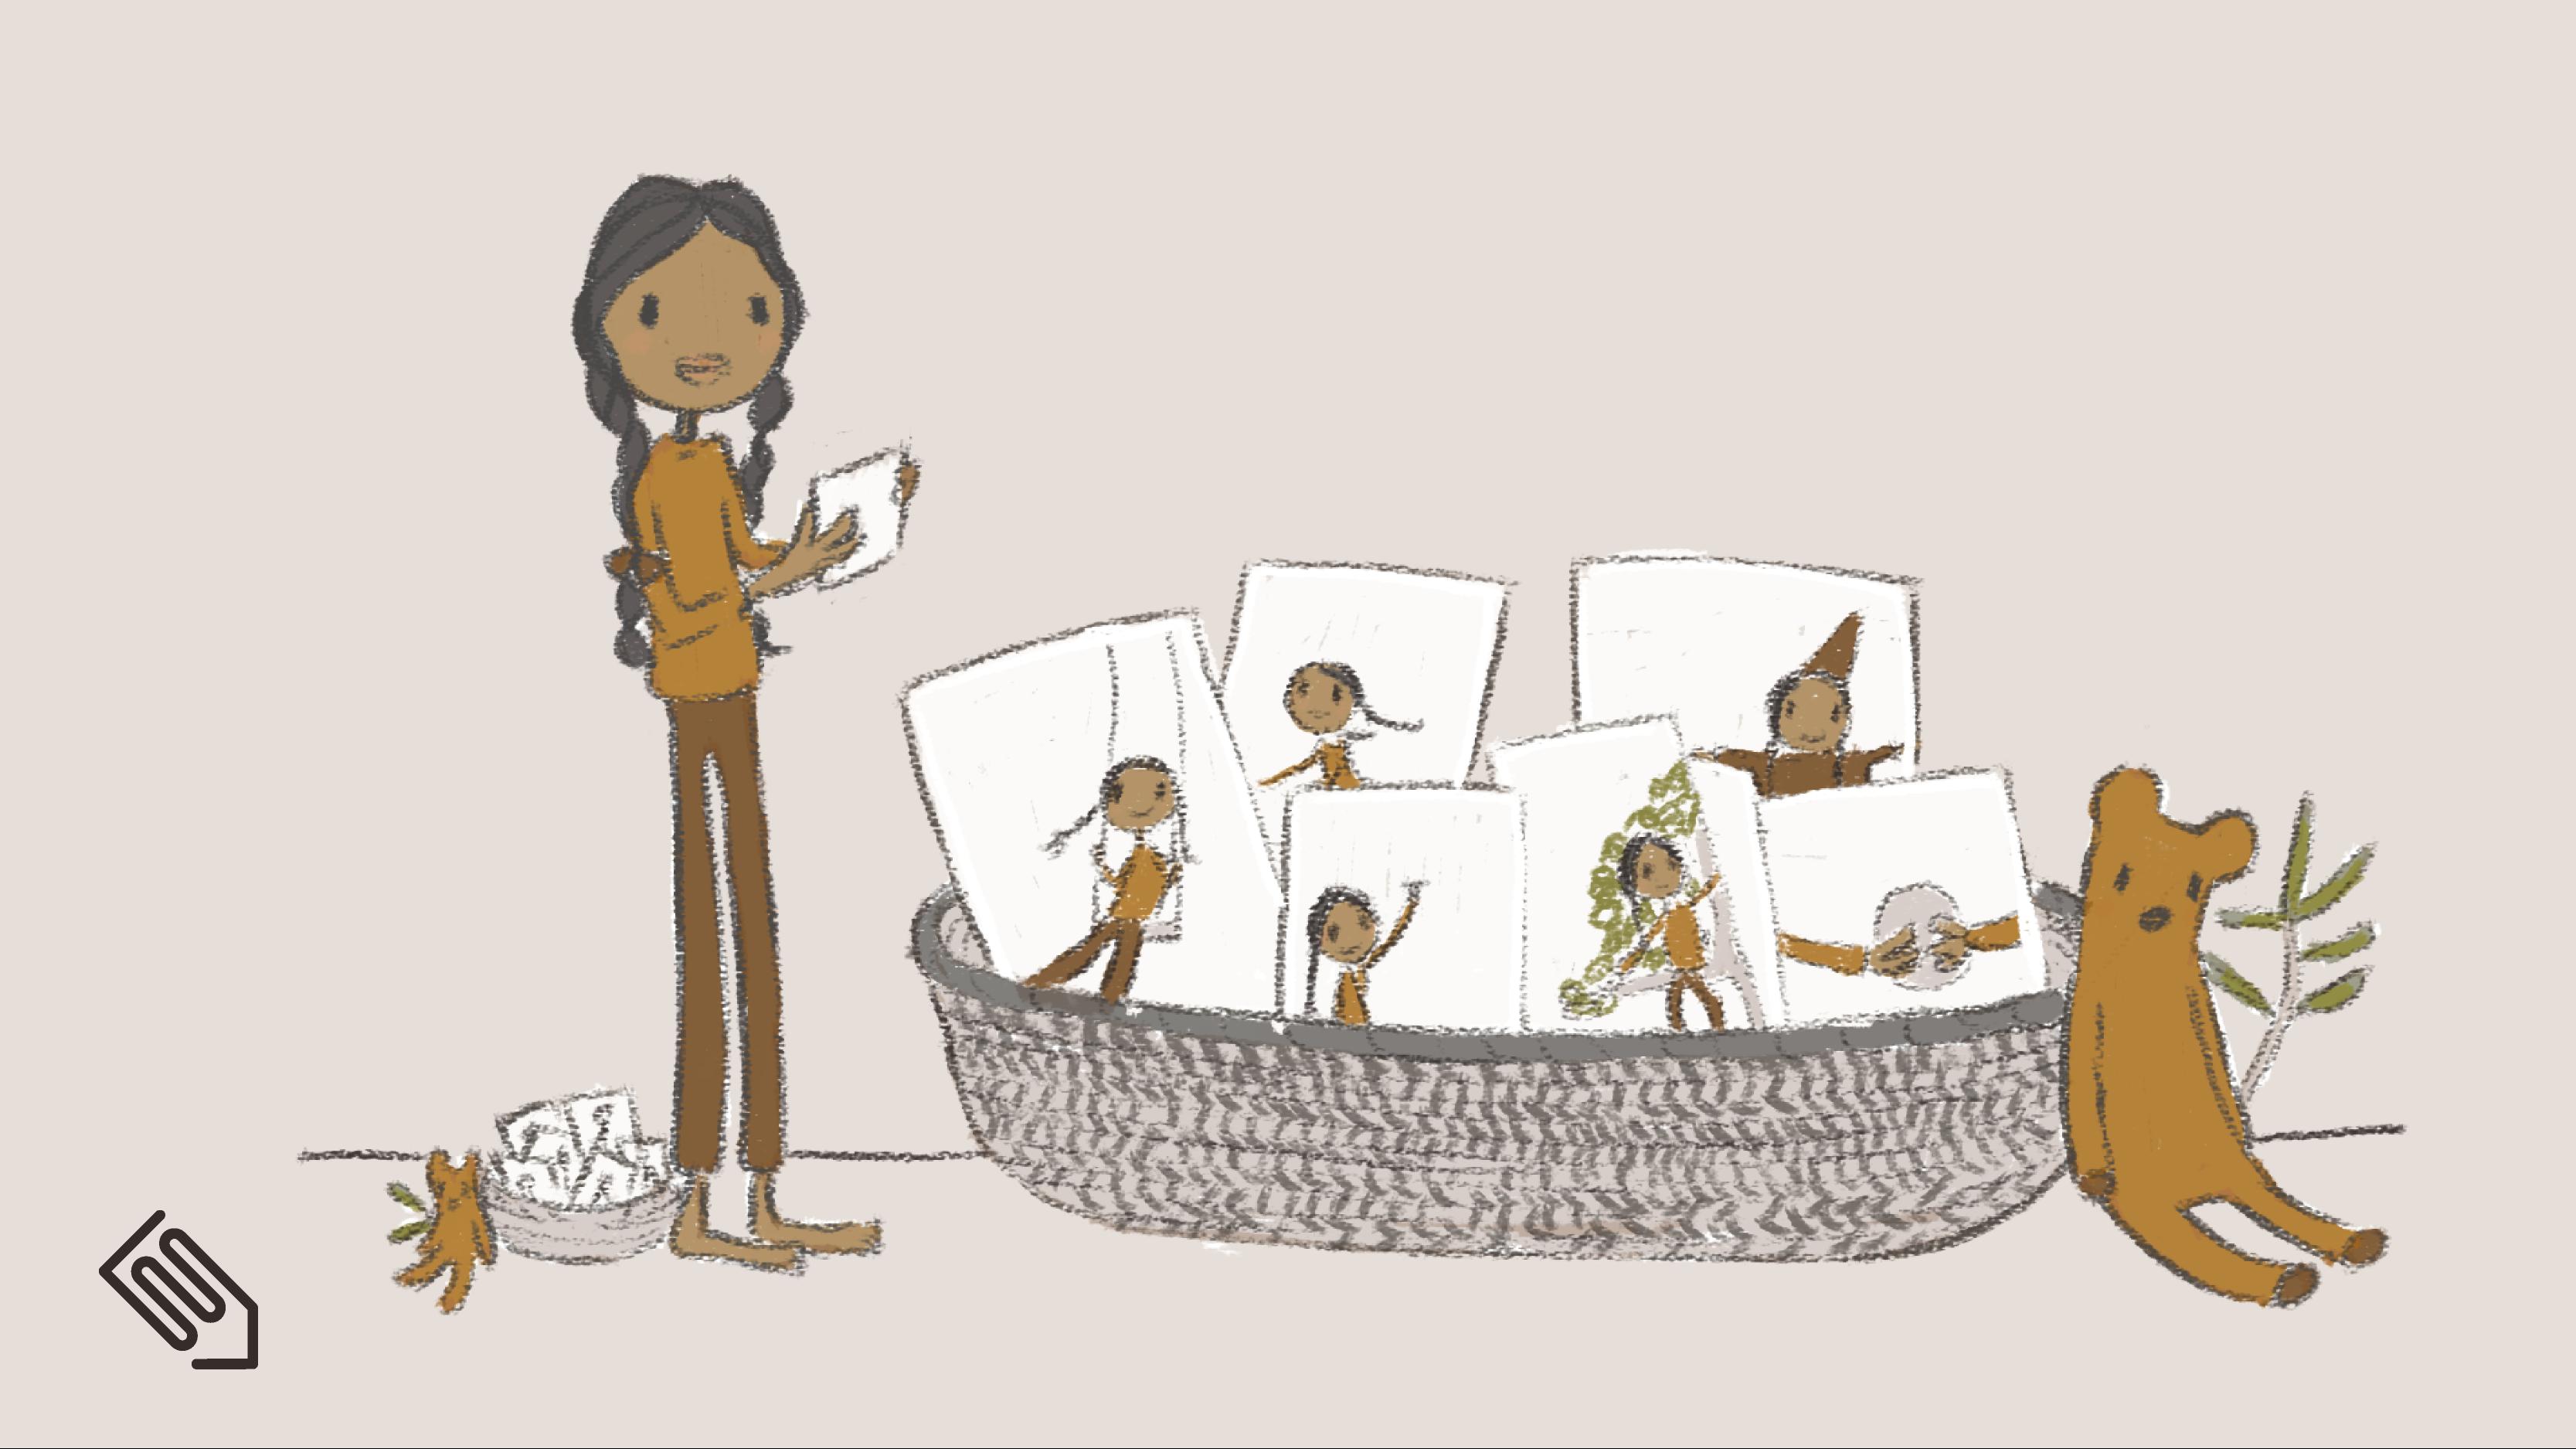 Children self-regulate with a basket of activities